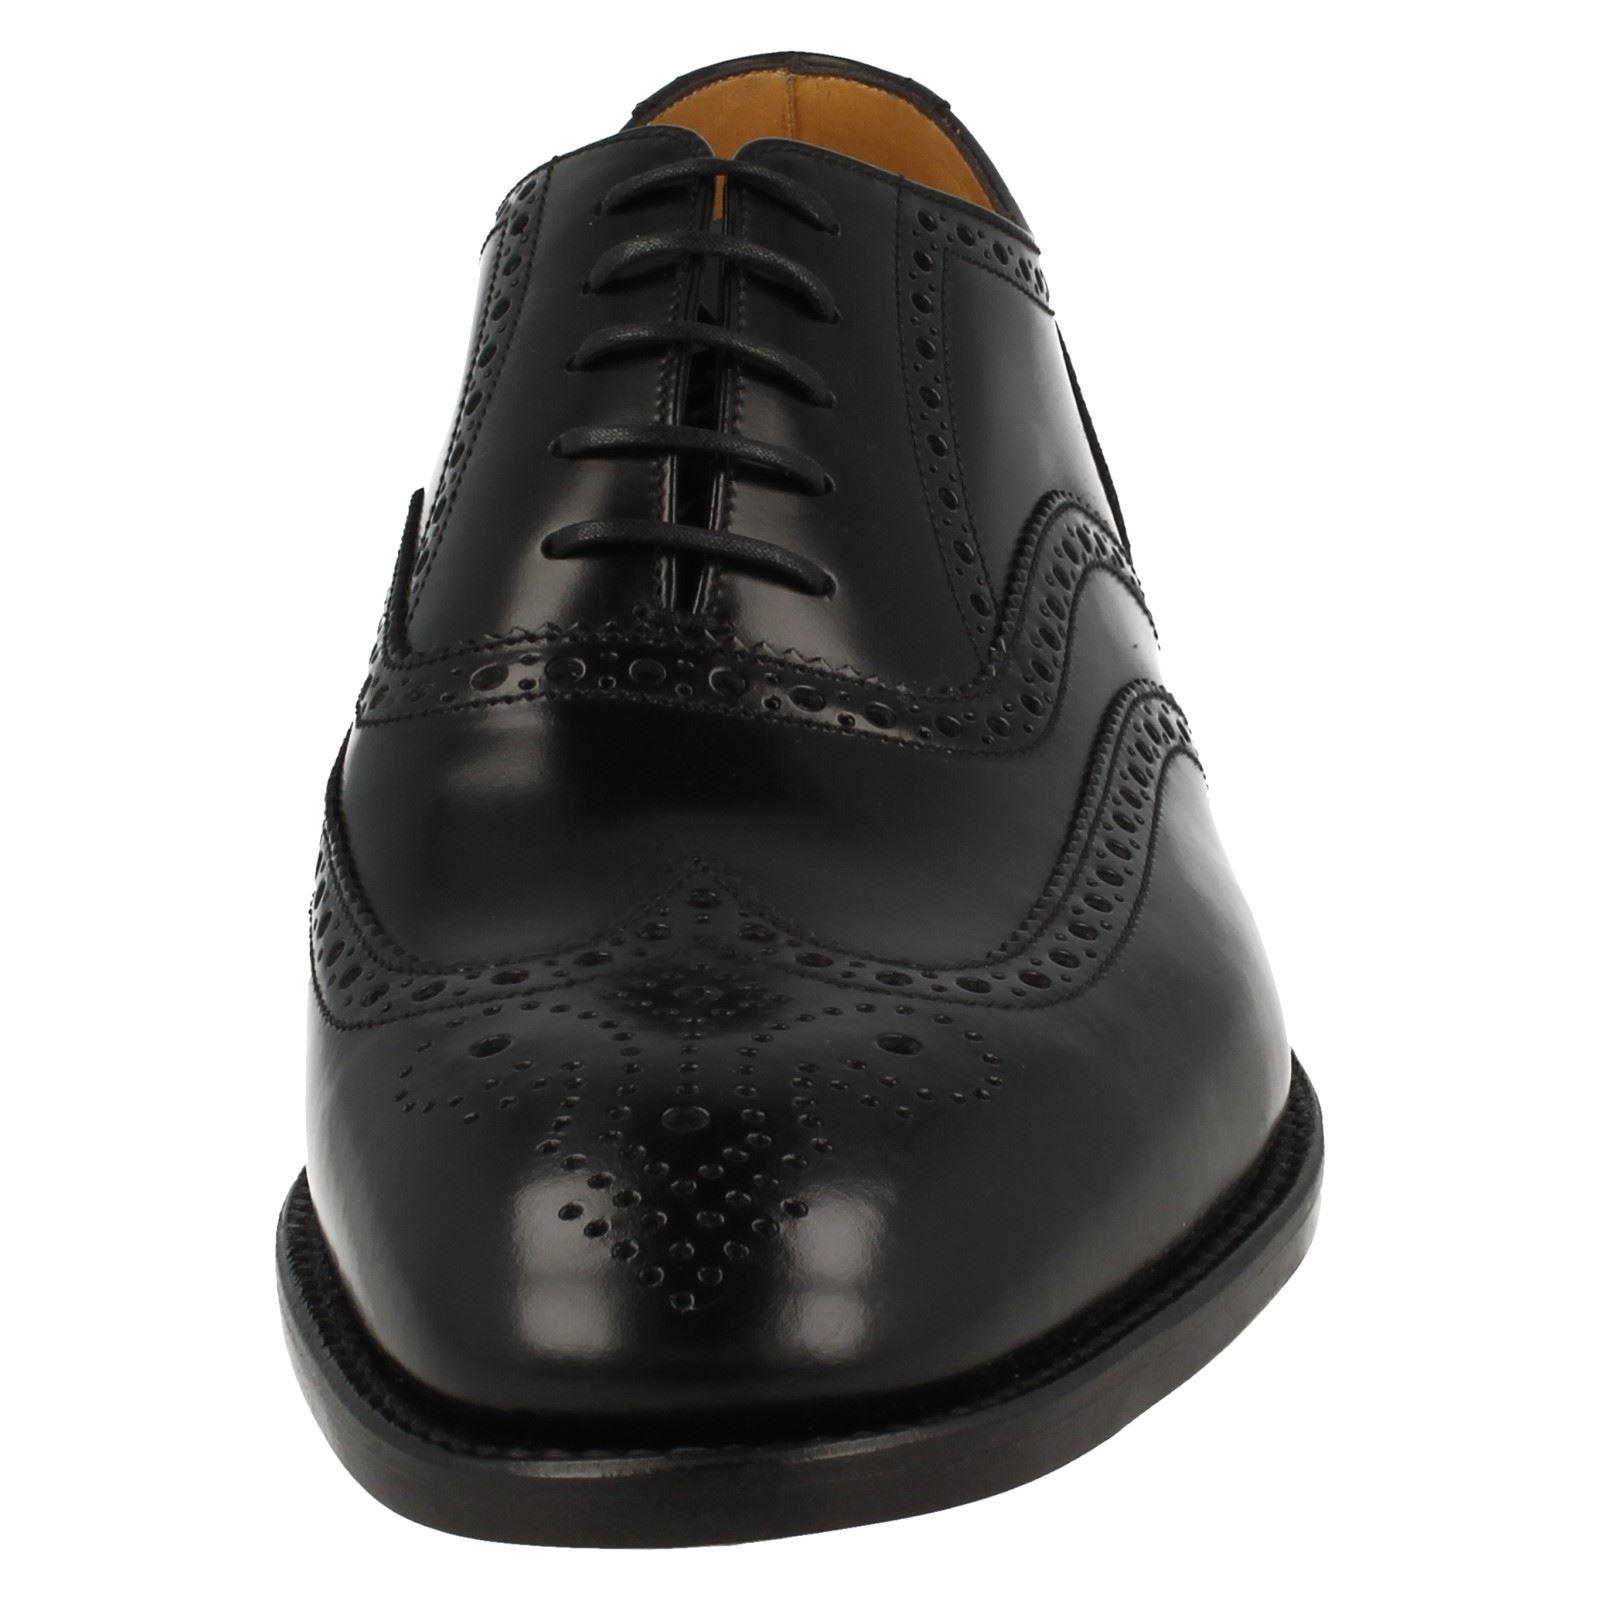 Herren Loake Formal Schuhes 758 634551